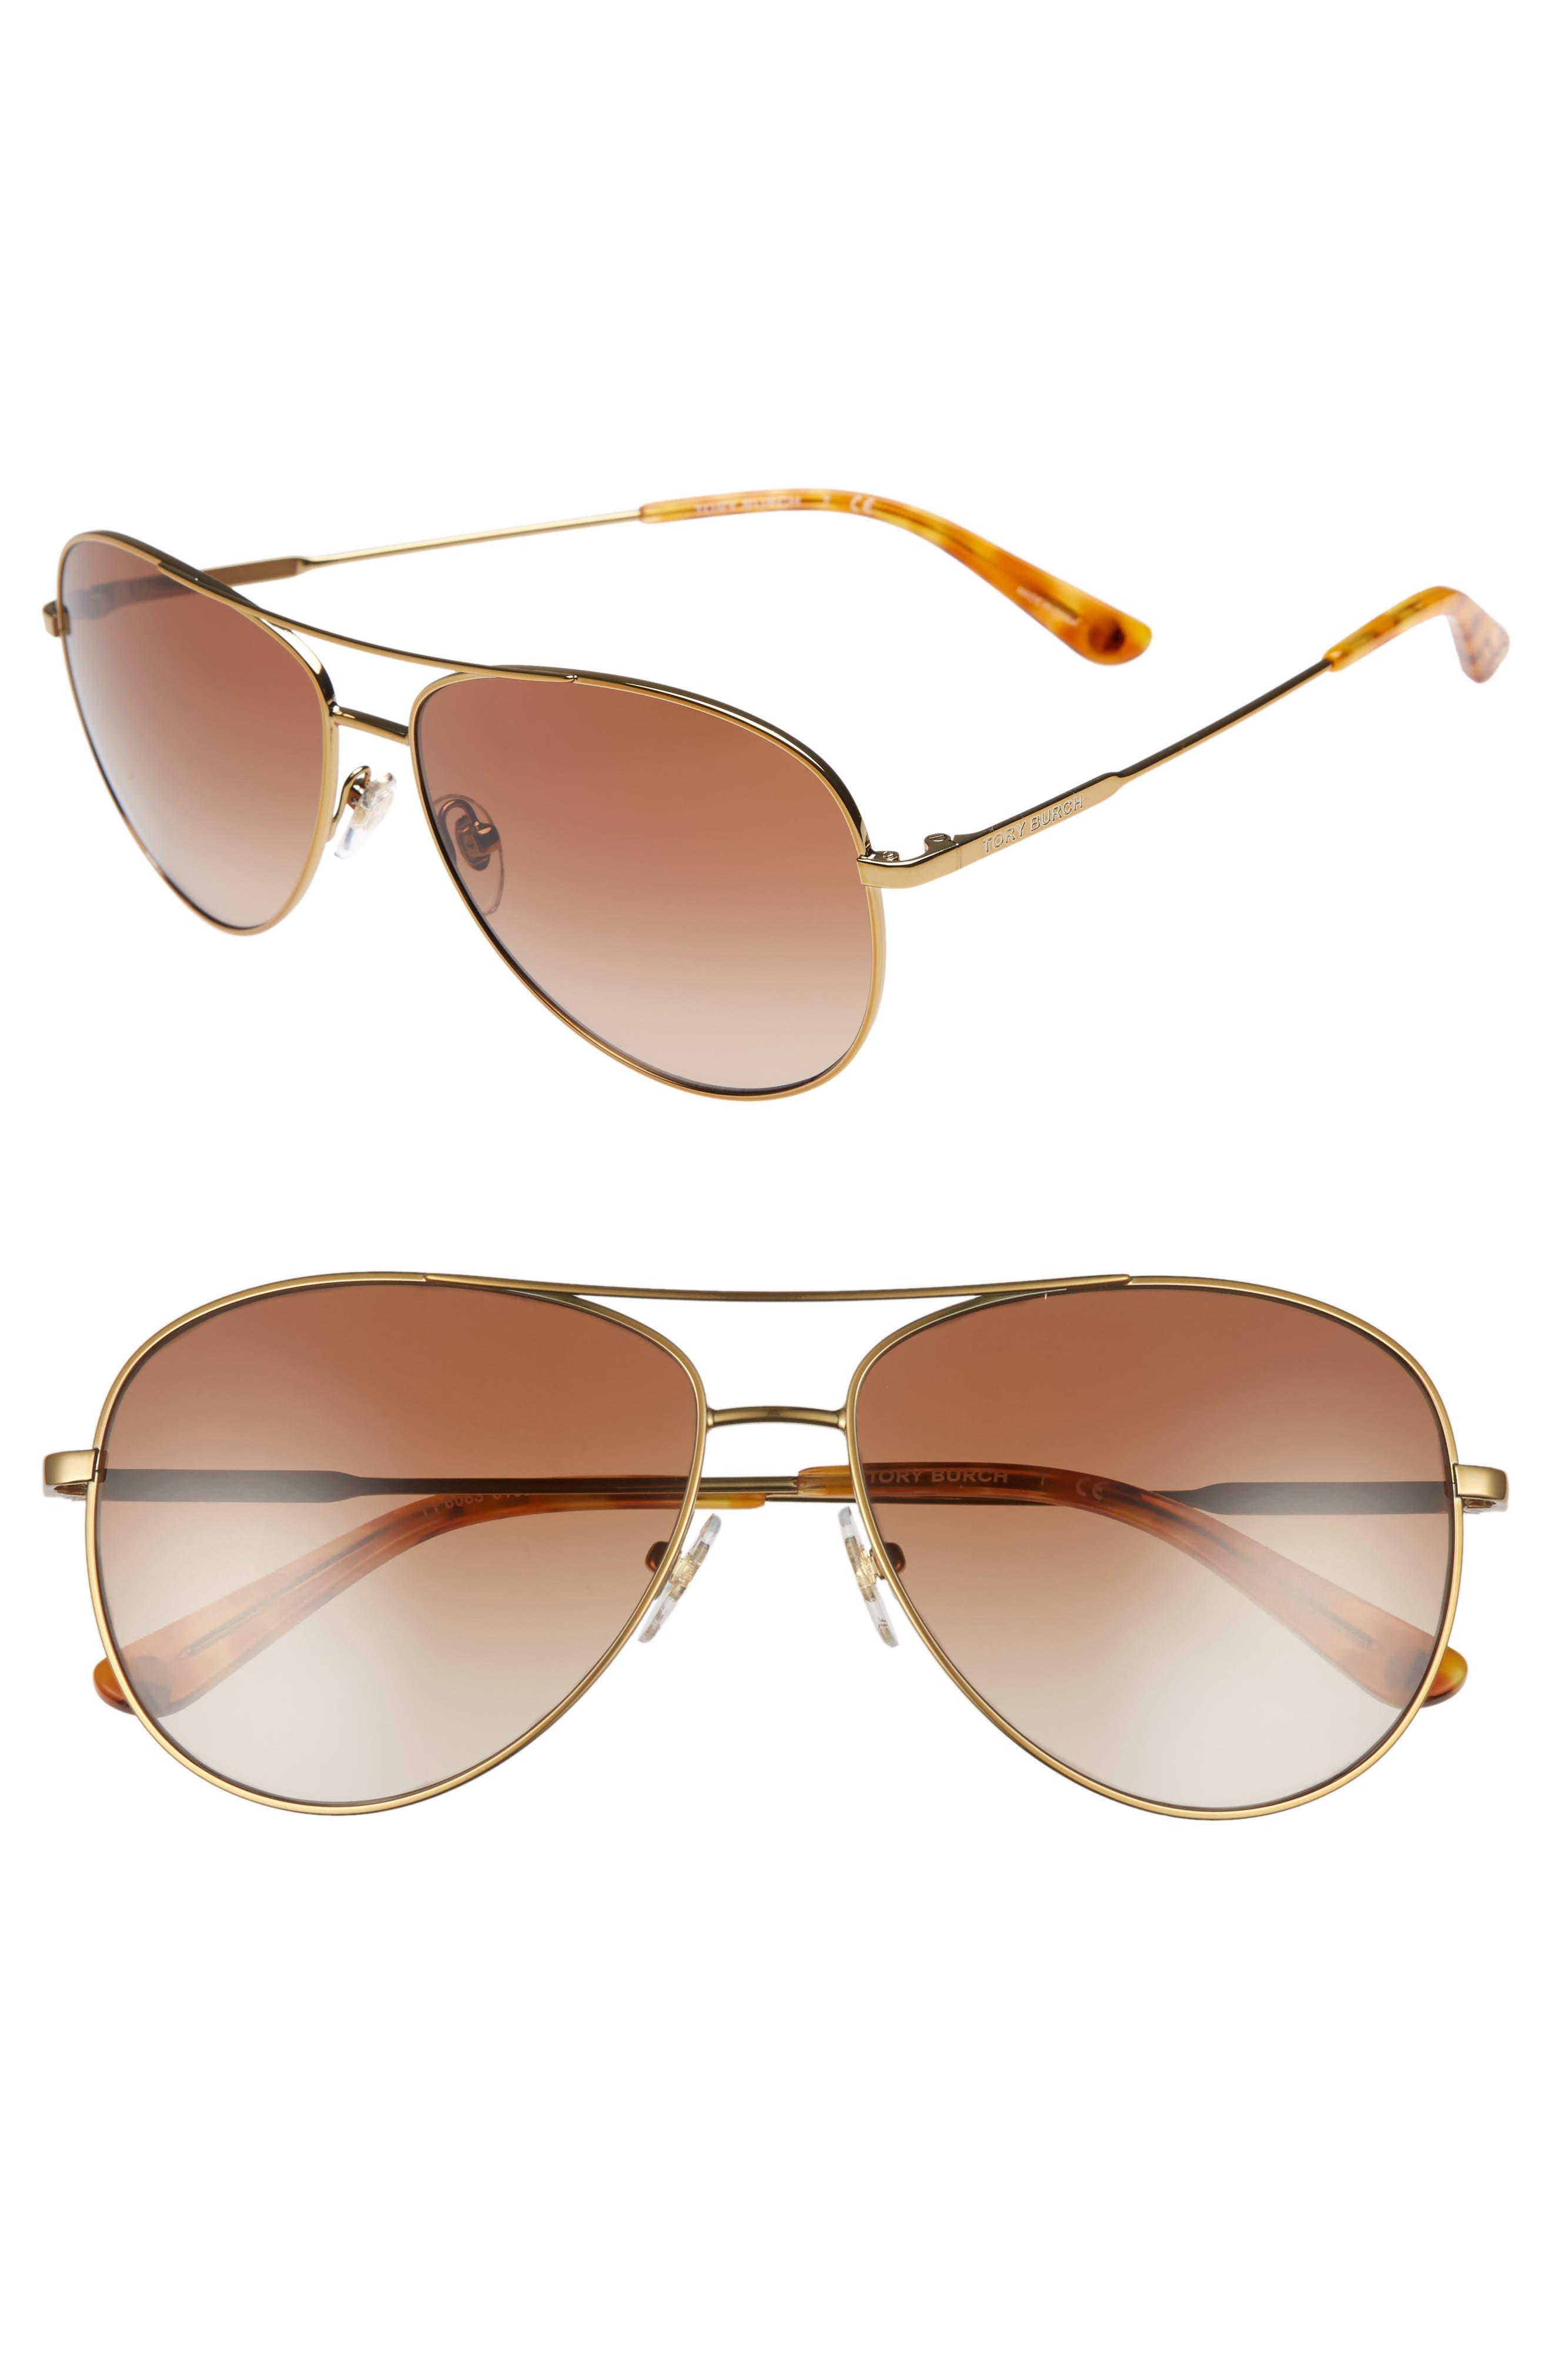 TORY BURCH, 59mm Metal Aviator Sunglasses, Main thumbnail 1, color, 710